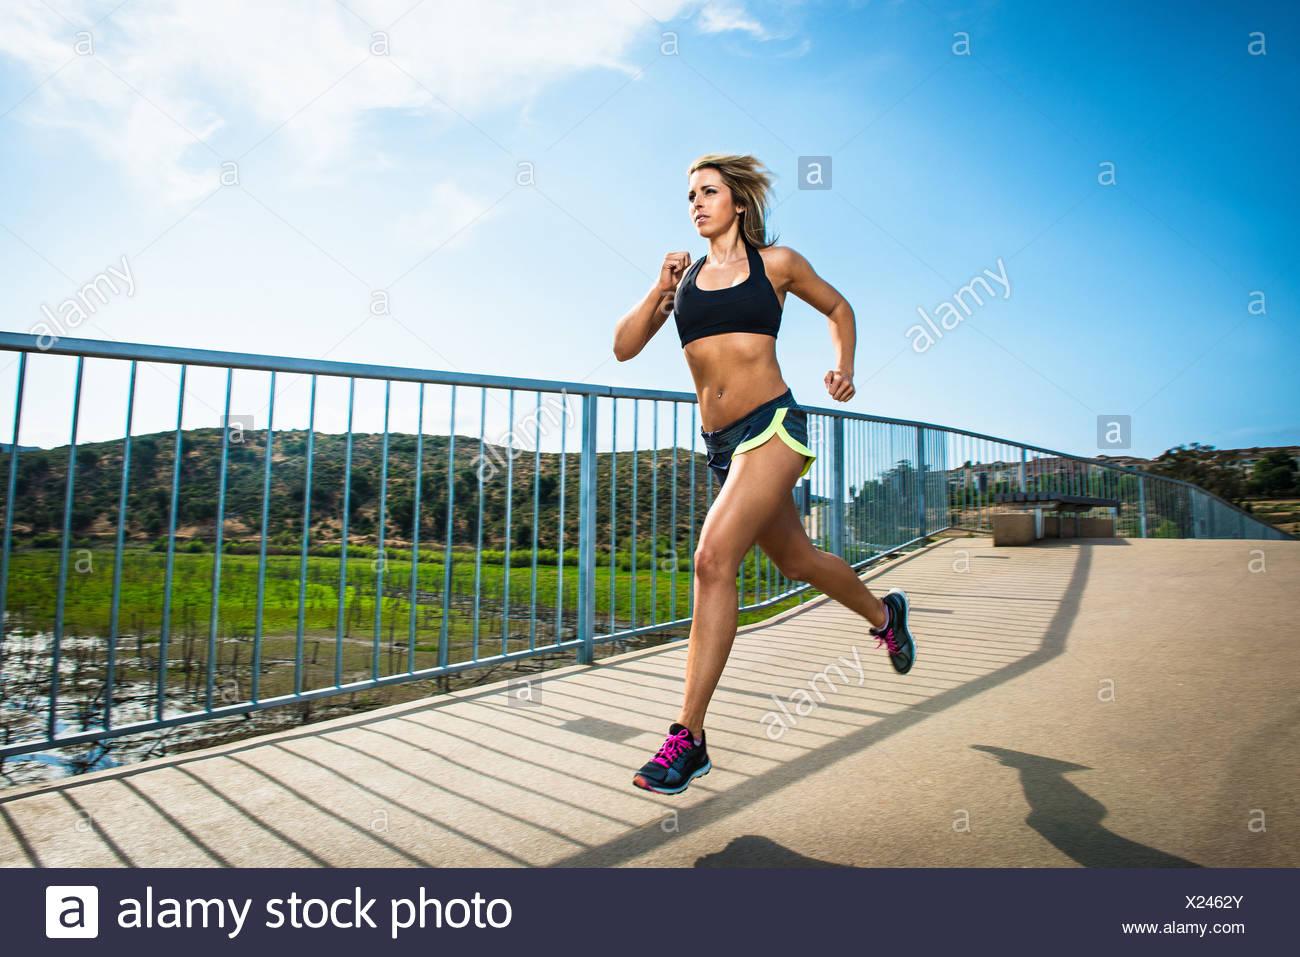 Athletic woman running on bridge Photo Stock